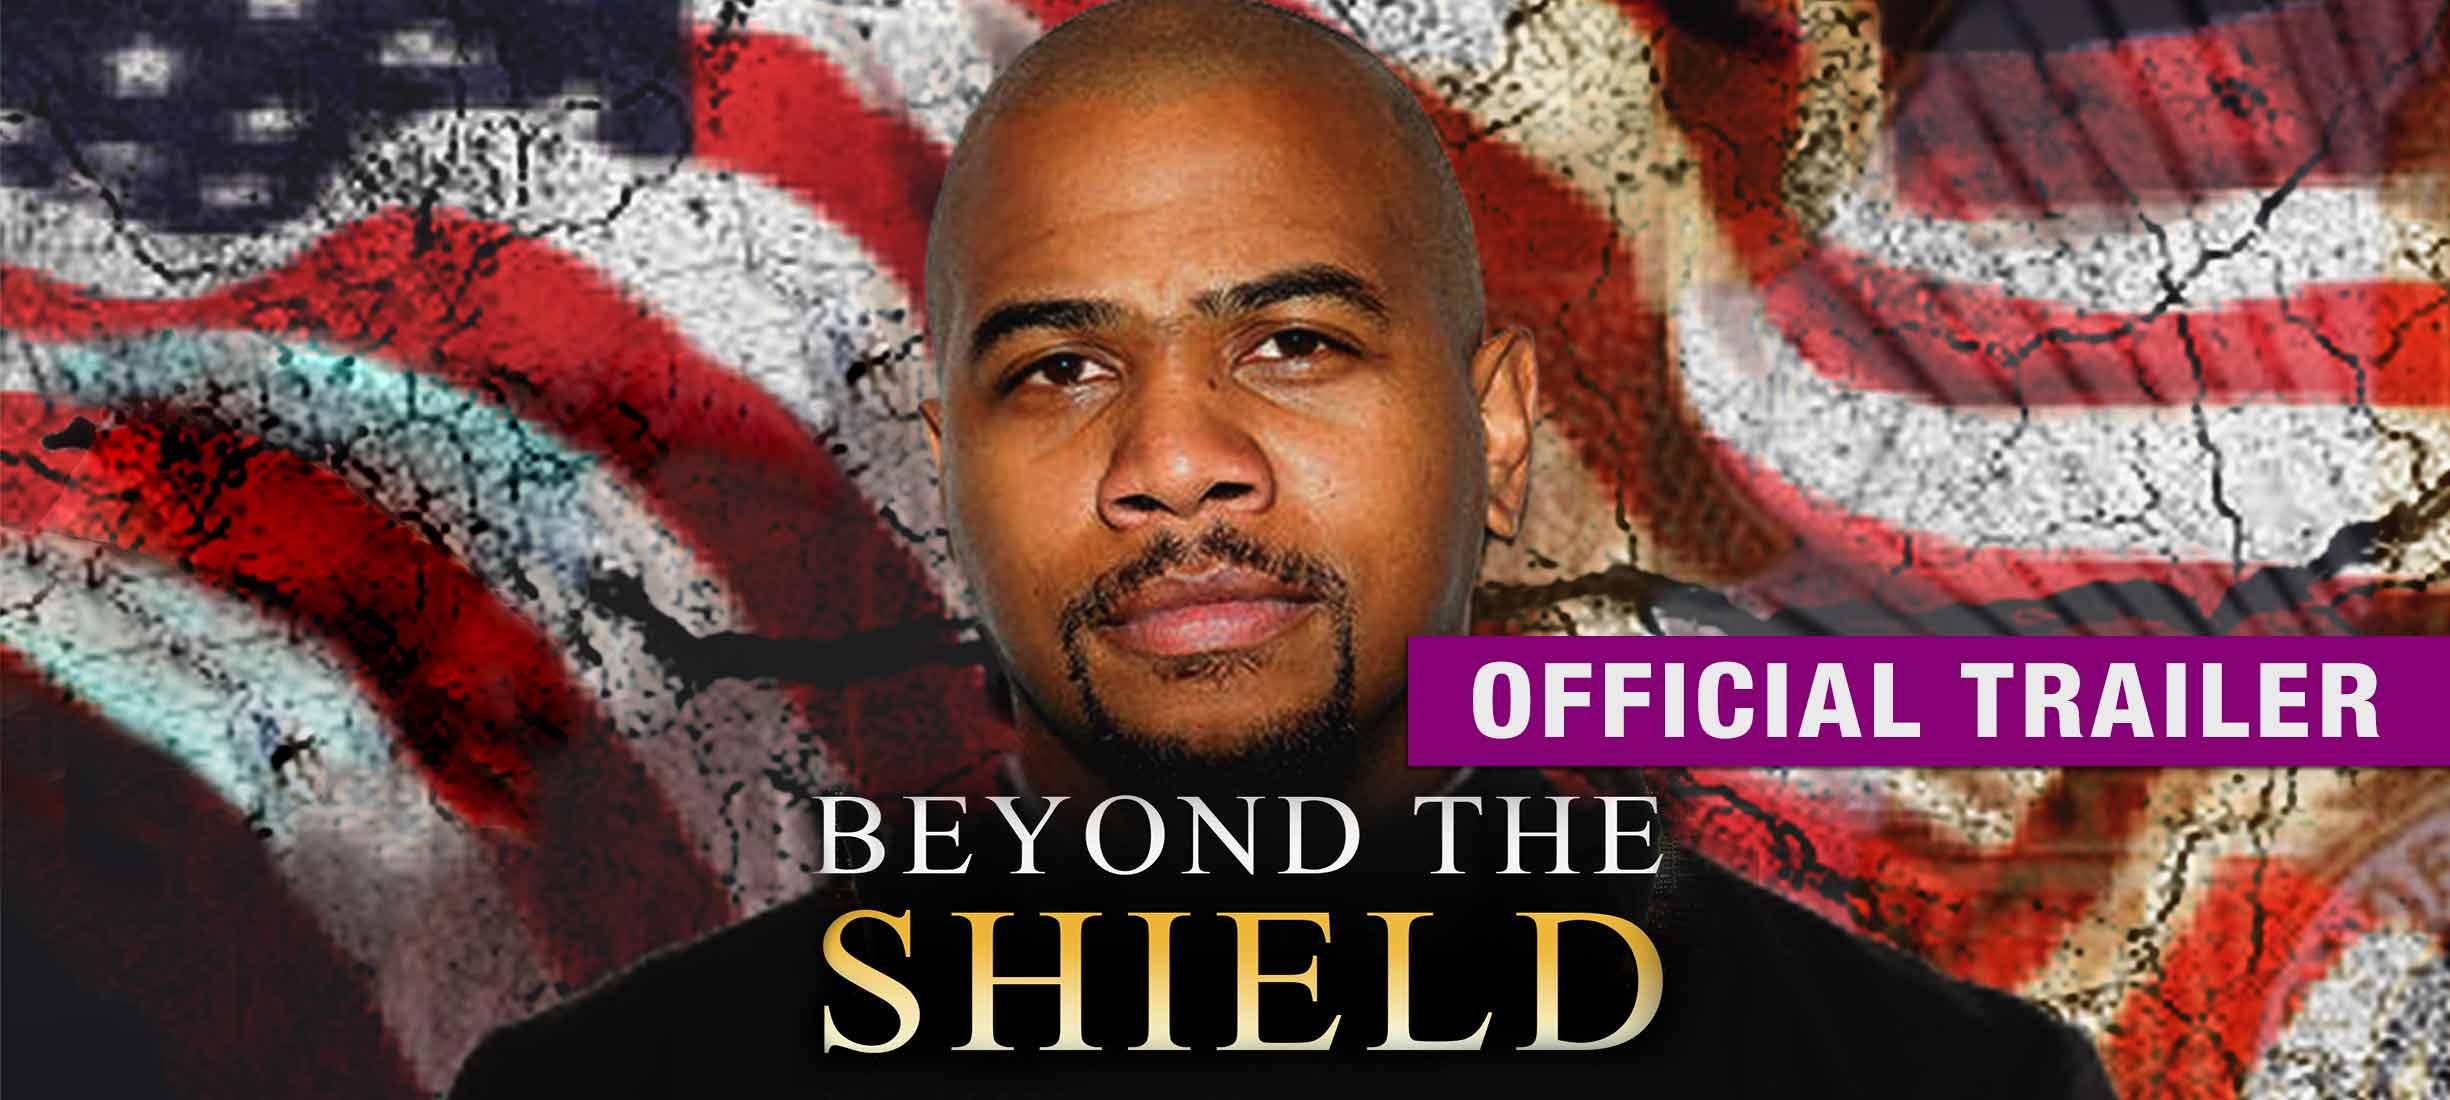 Beyond the Shield: Trailer